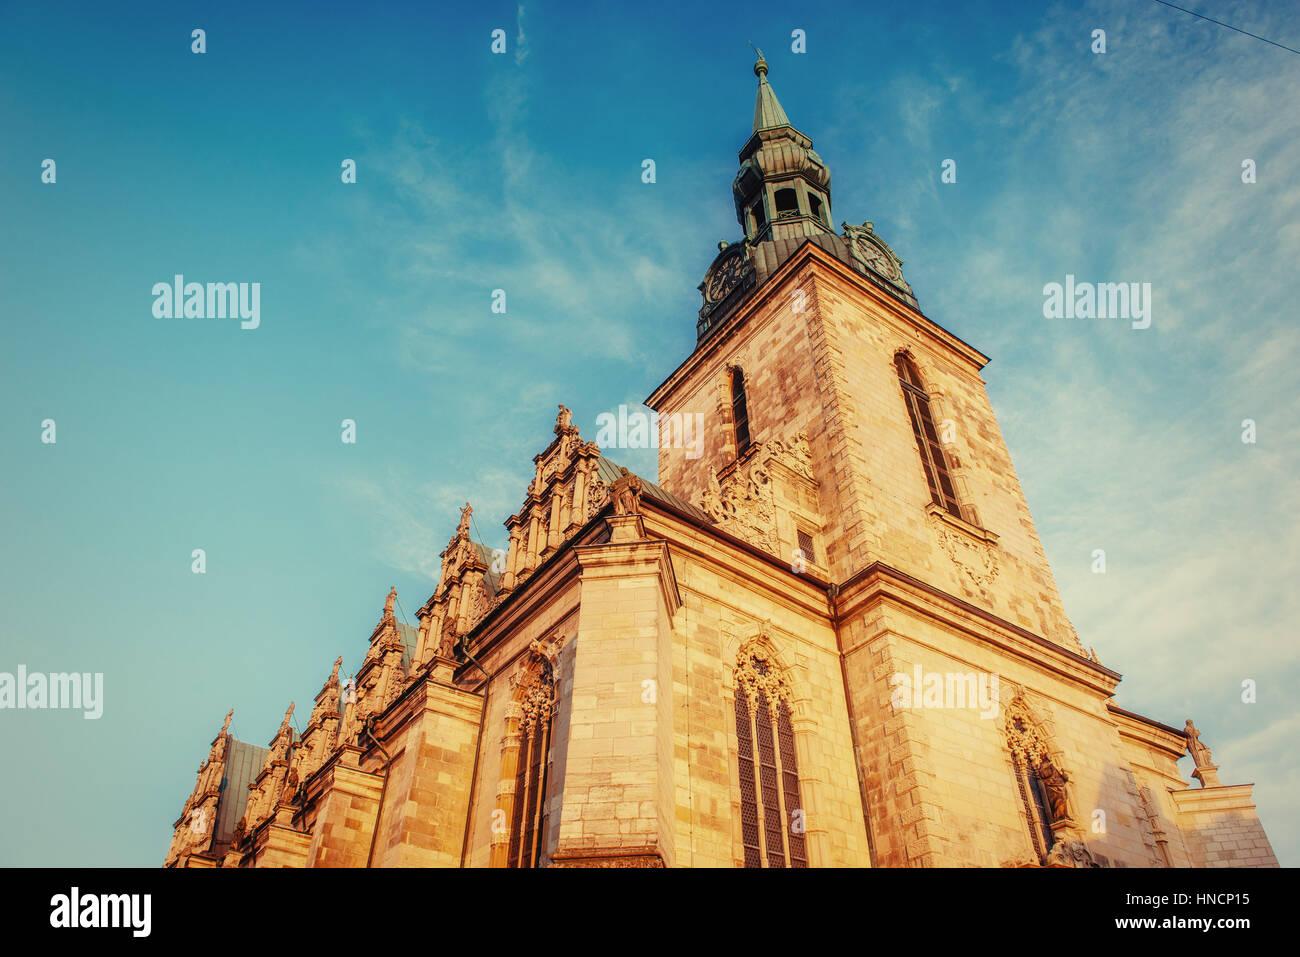 Holy Trinity Church. Germany. Little Venice. Europe - Stock Image